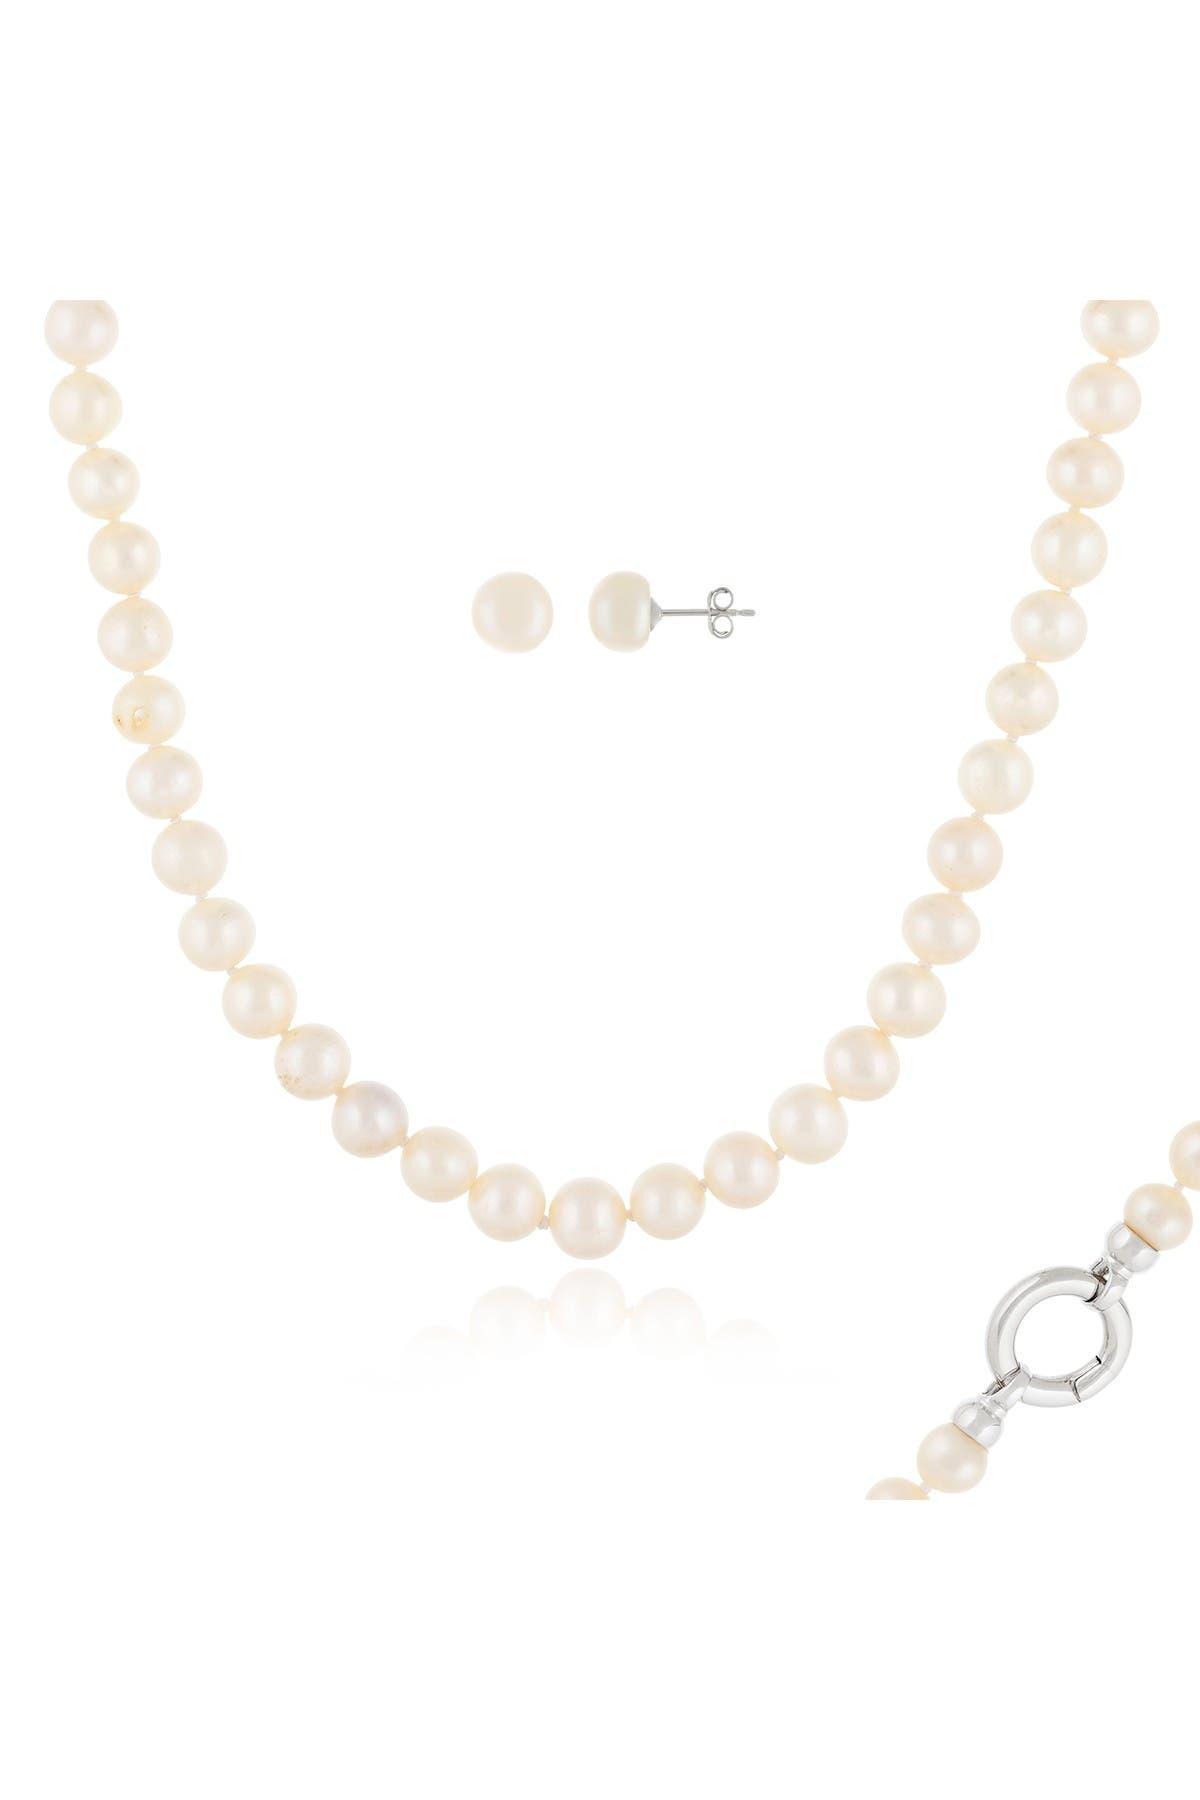 Image of Splendid Pearls 8-9mm Freshwater Pearl Stud Earring & Necklace Set